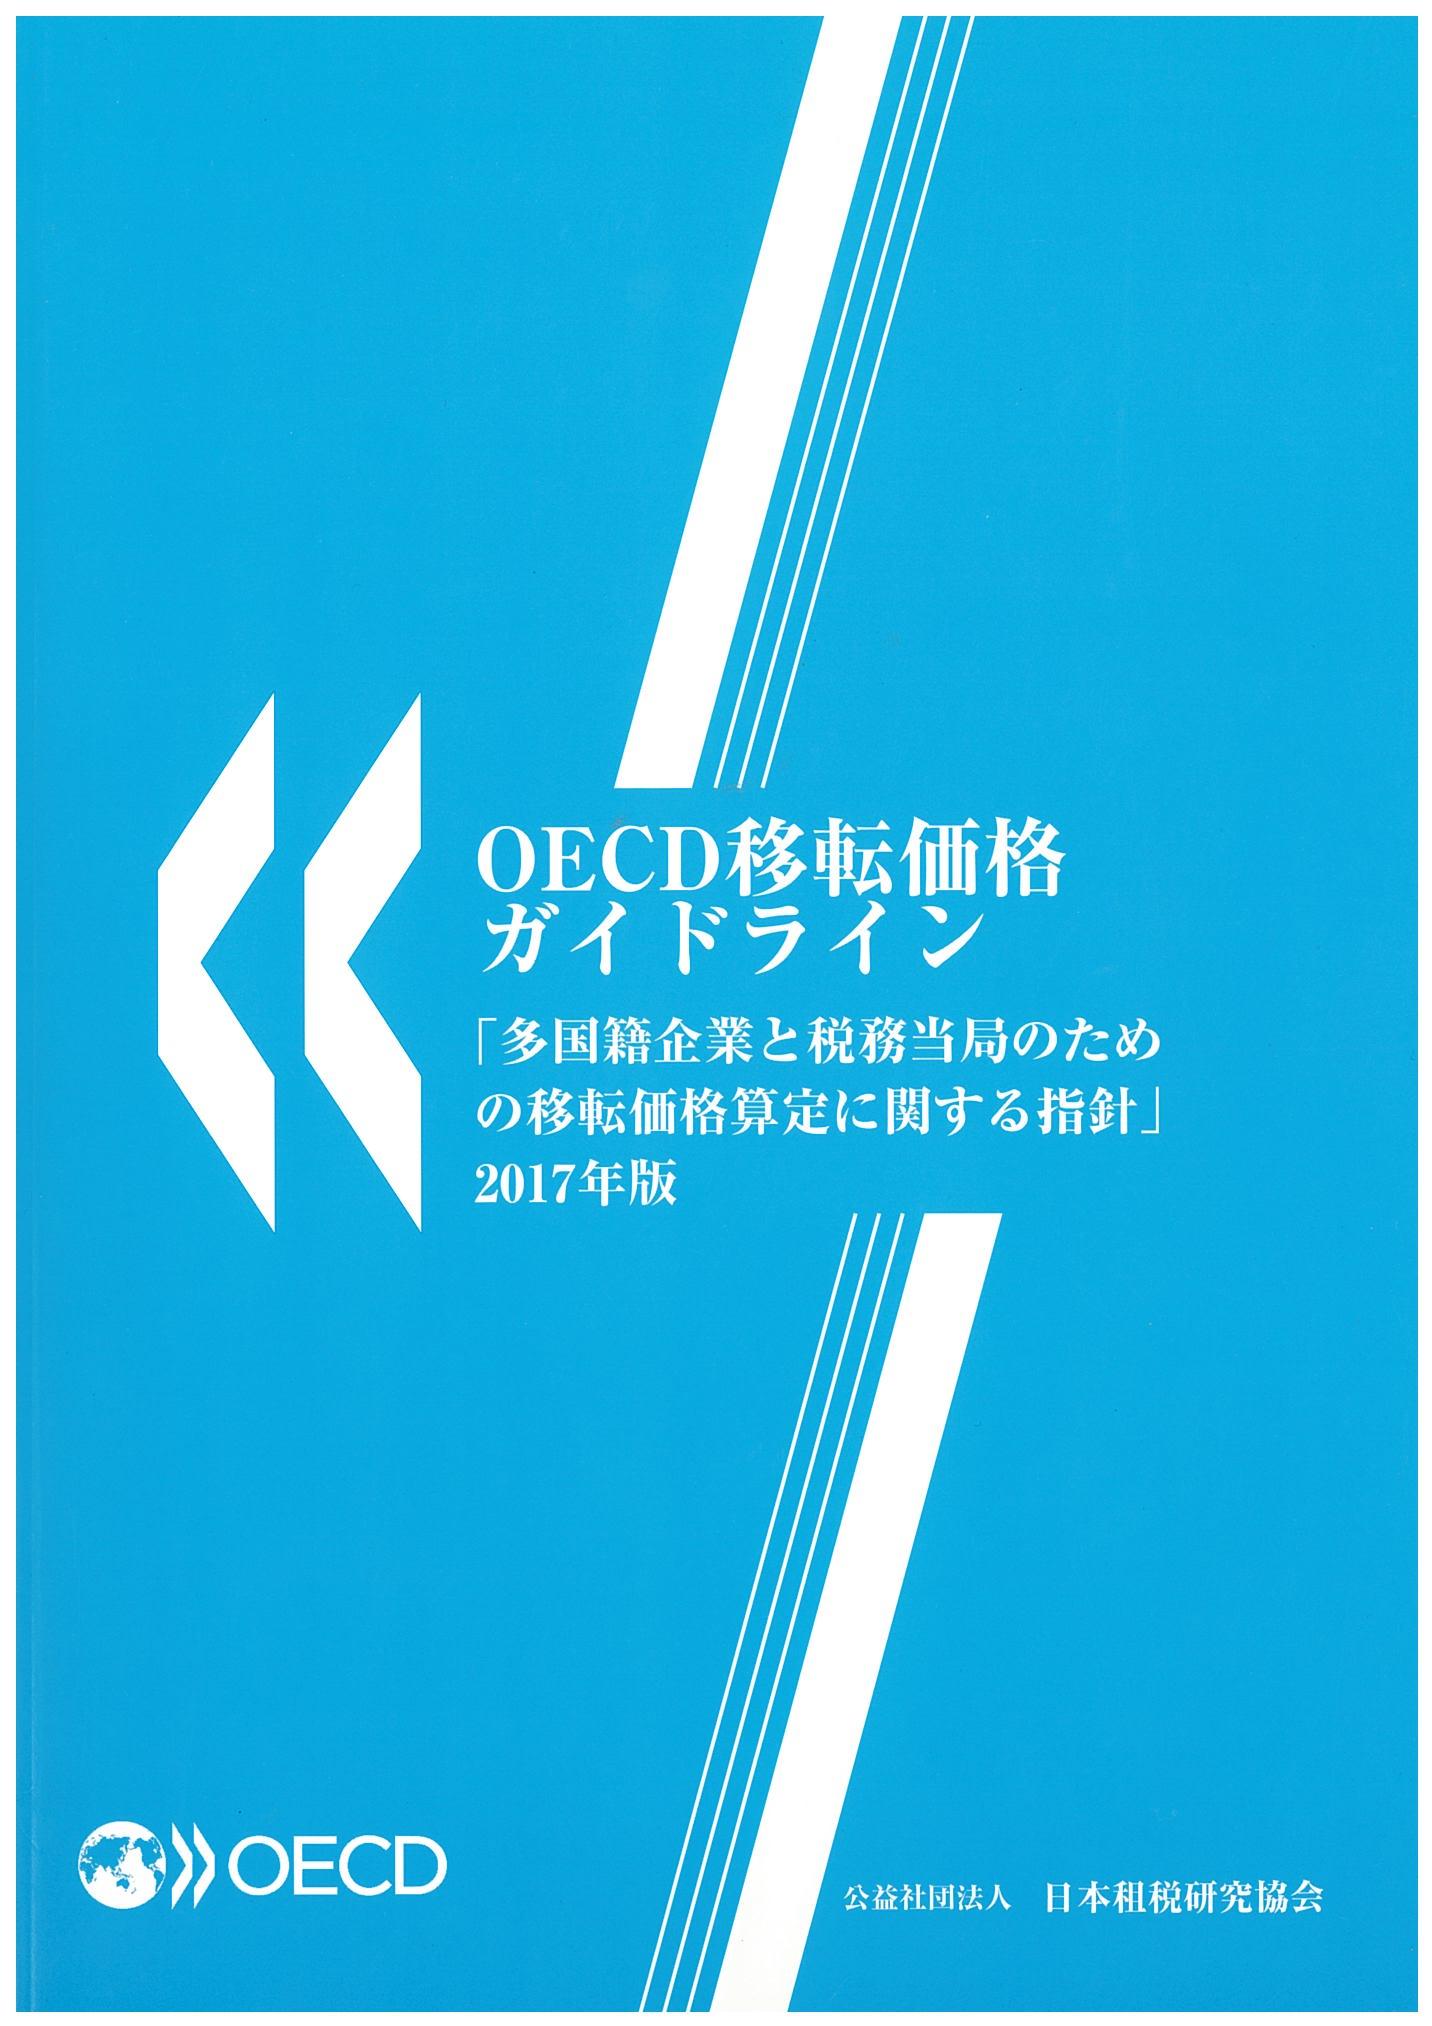 OECD OECD移転価格ガイドライン 「多国籍企業と税務当局のための移転価格算定に関する指針」 2017年版